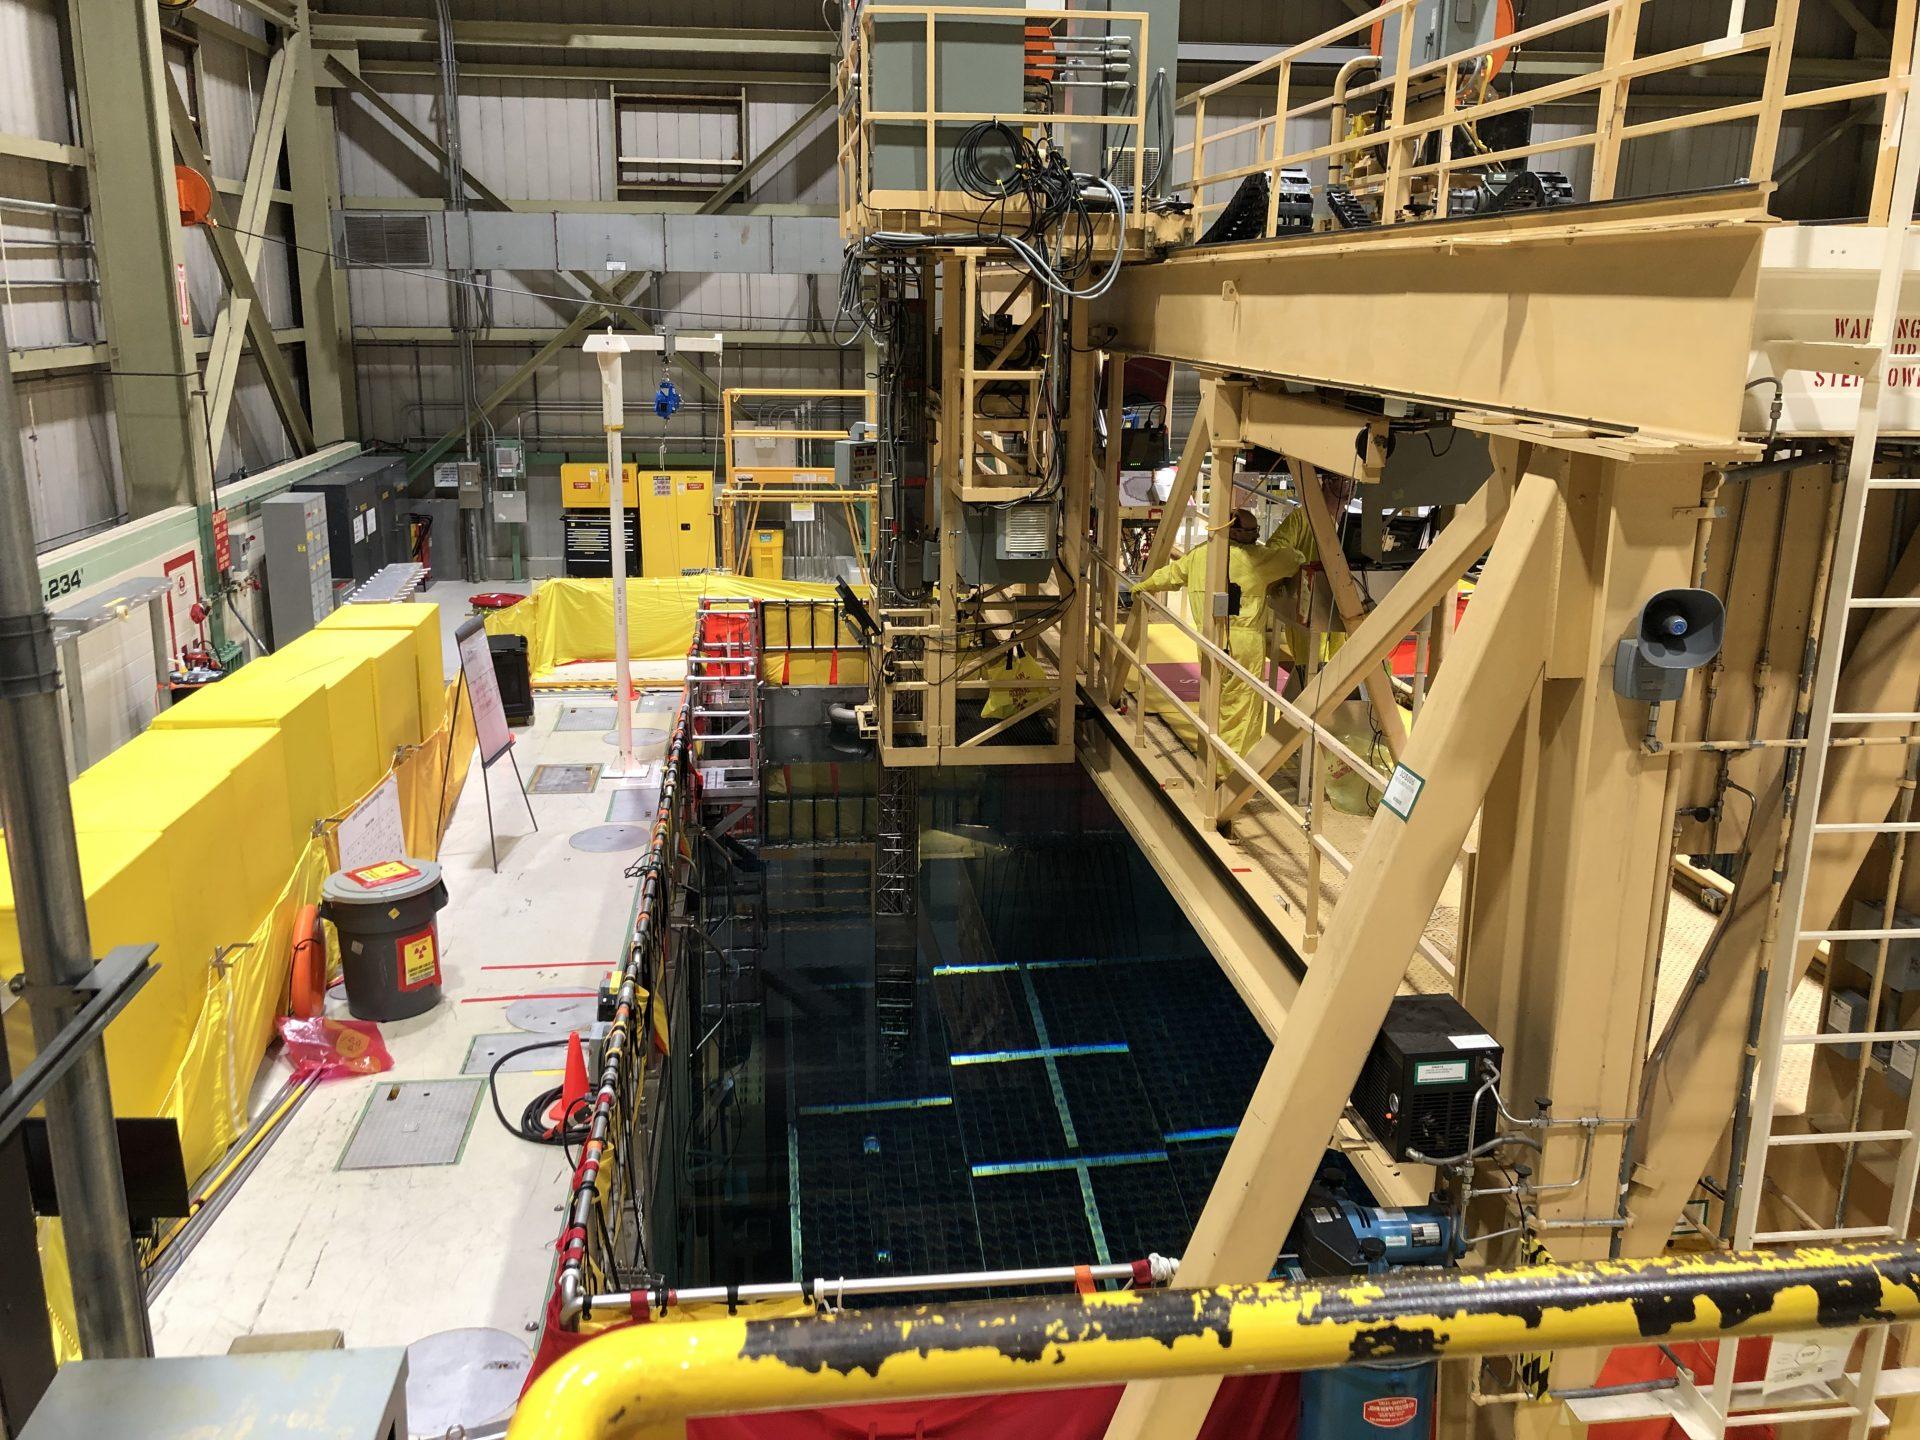 Inside Pa.'s Peach Bottom nuclear power plant - WHYY